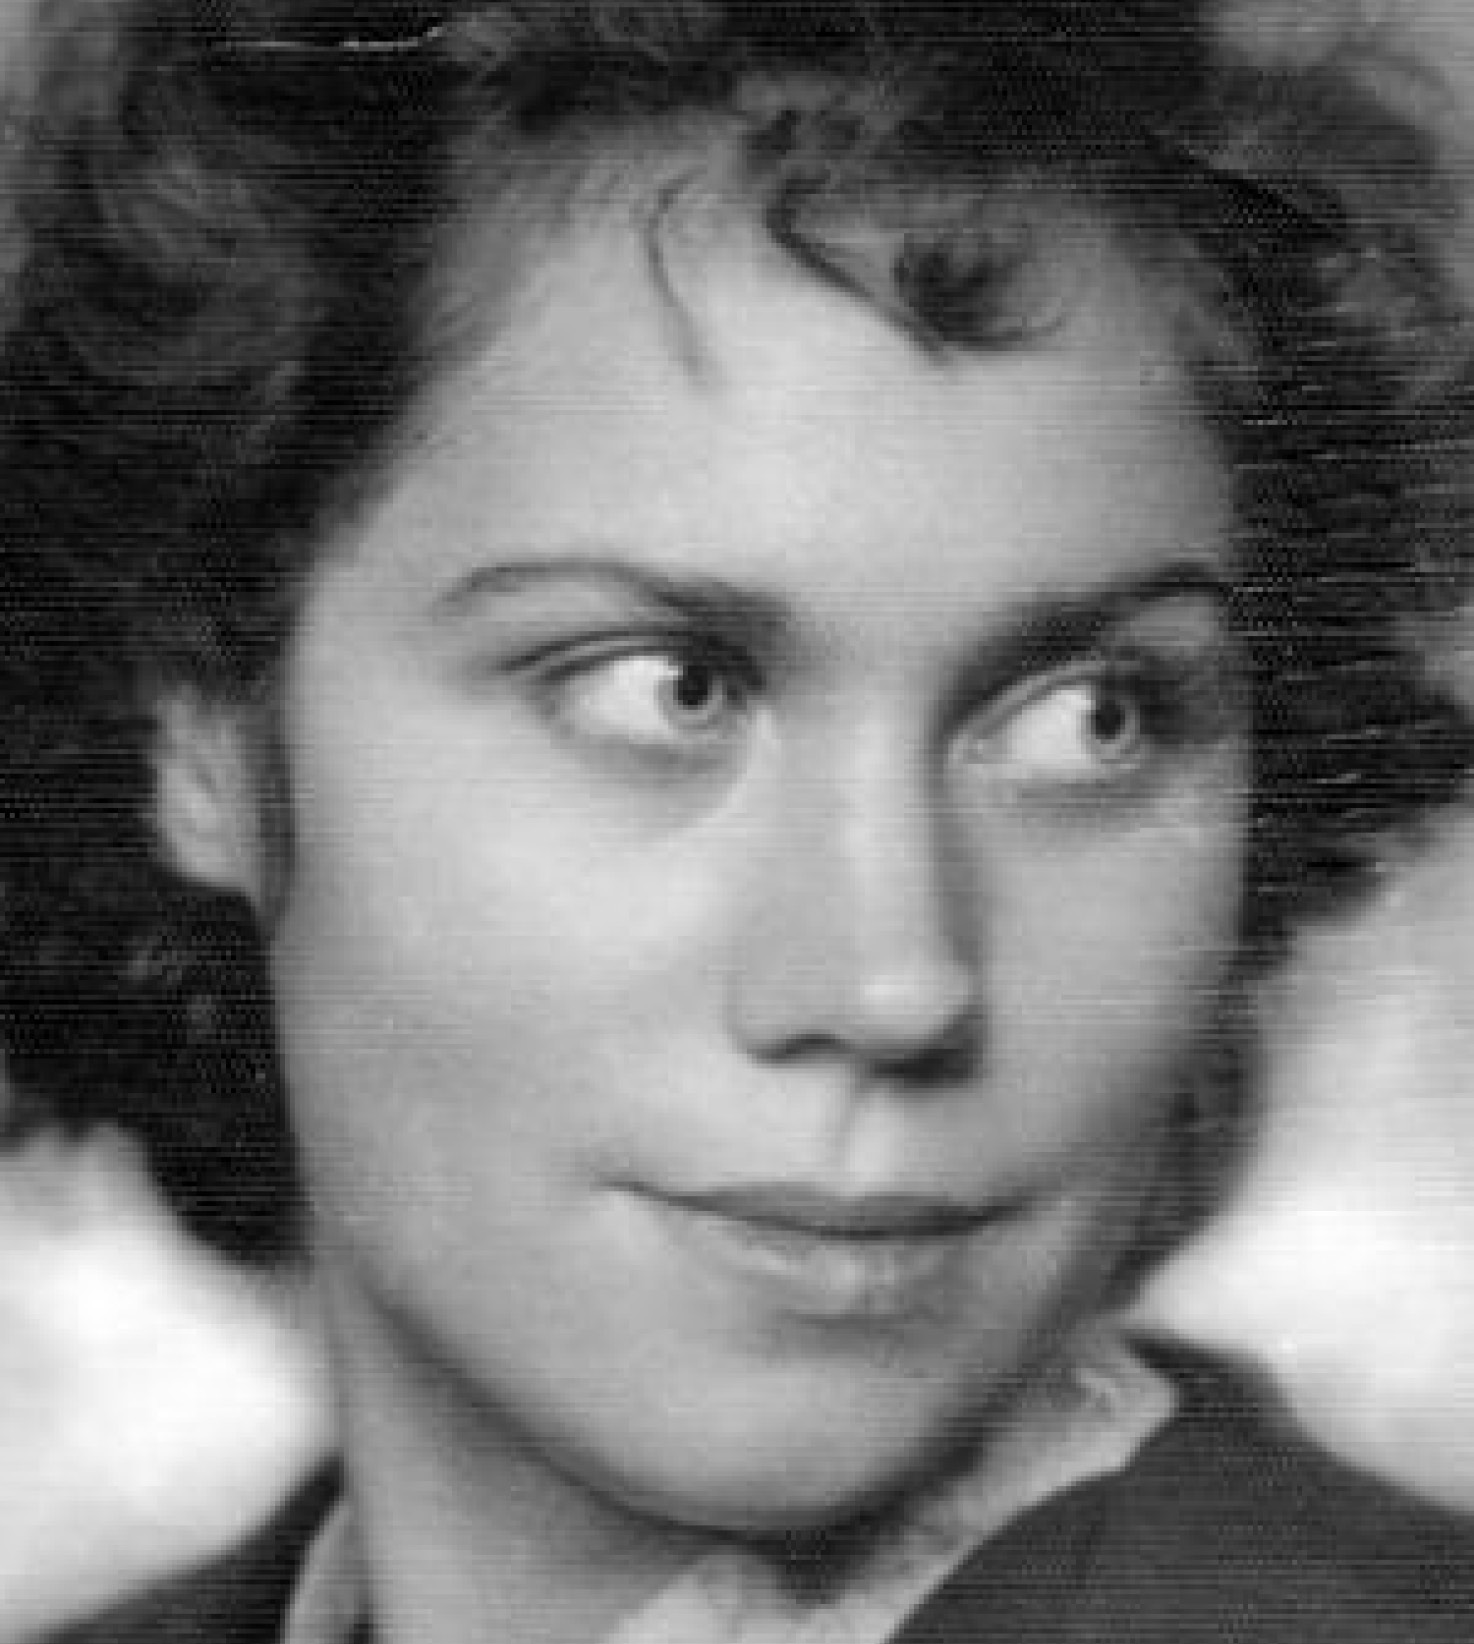 Alevtina Rumyantseva